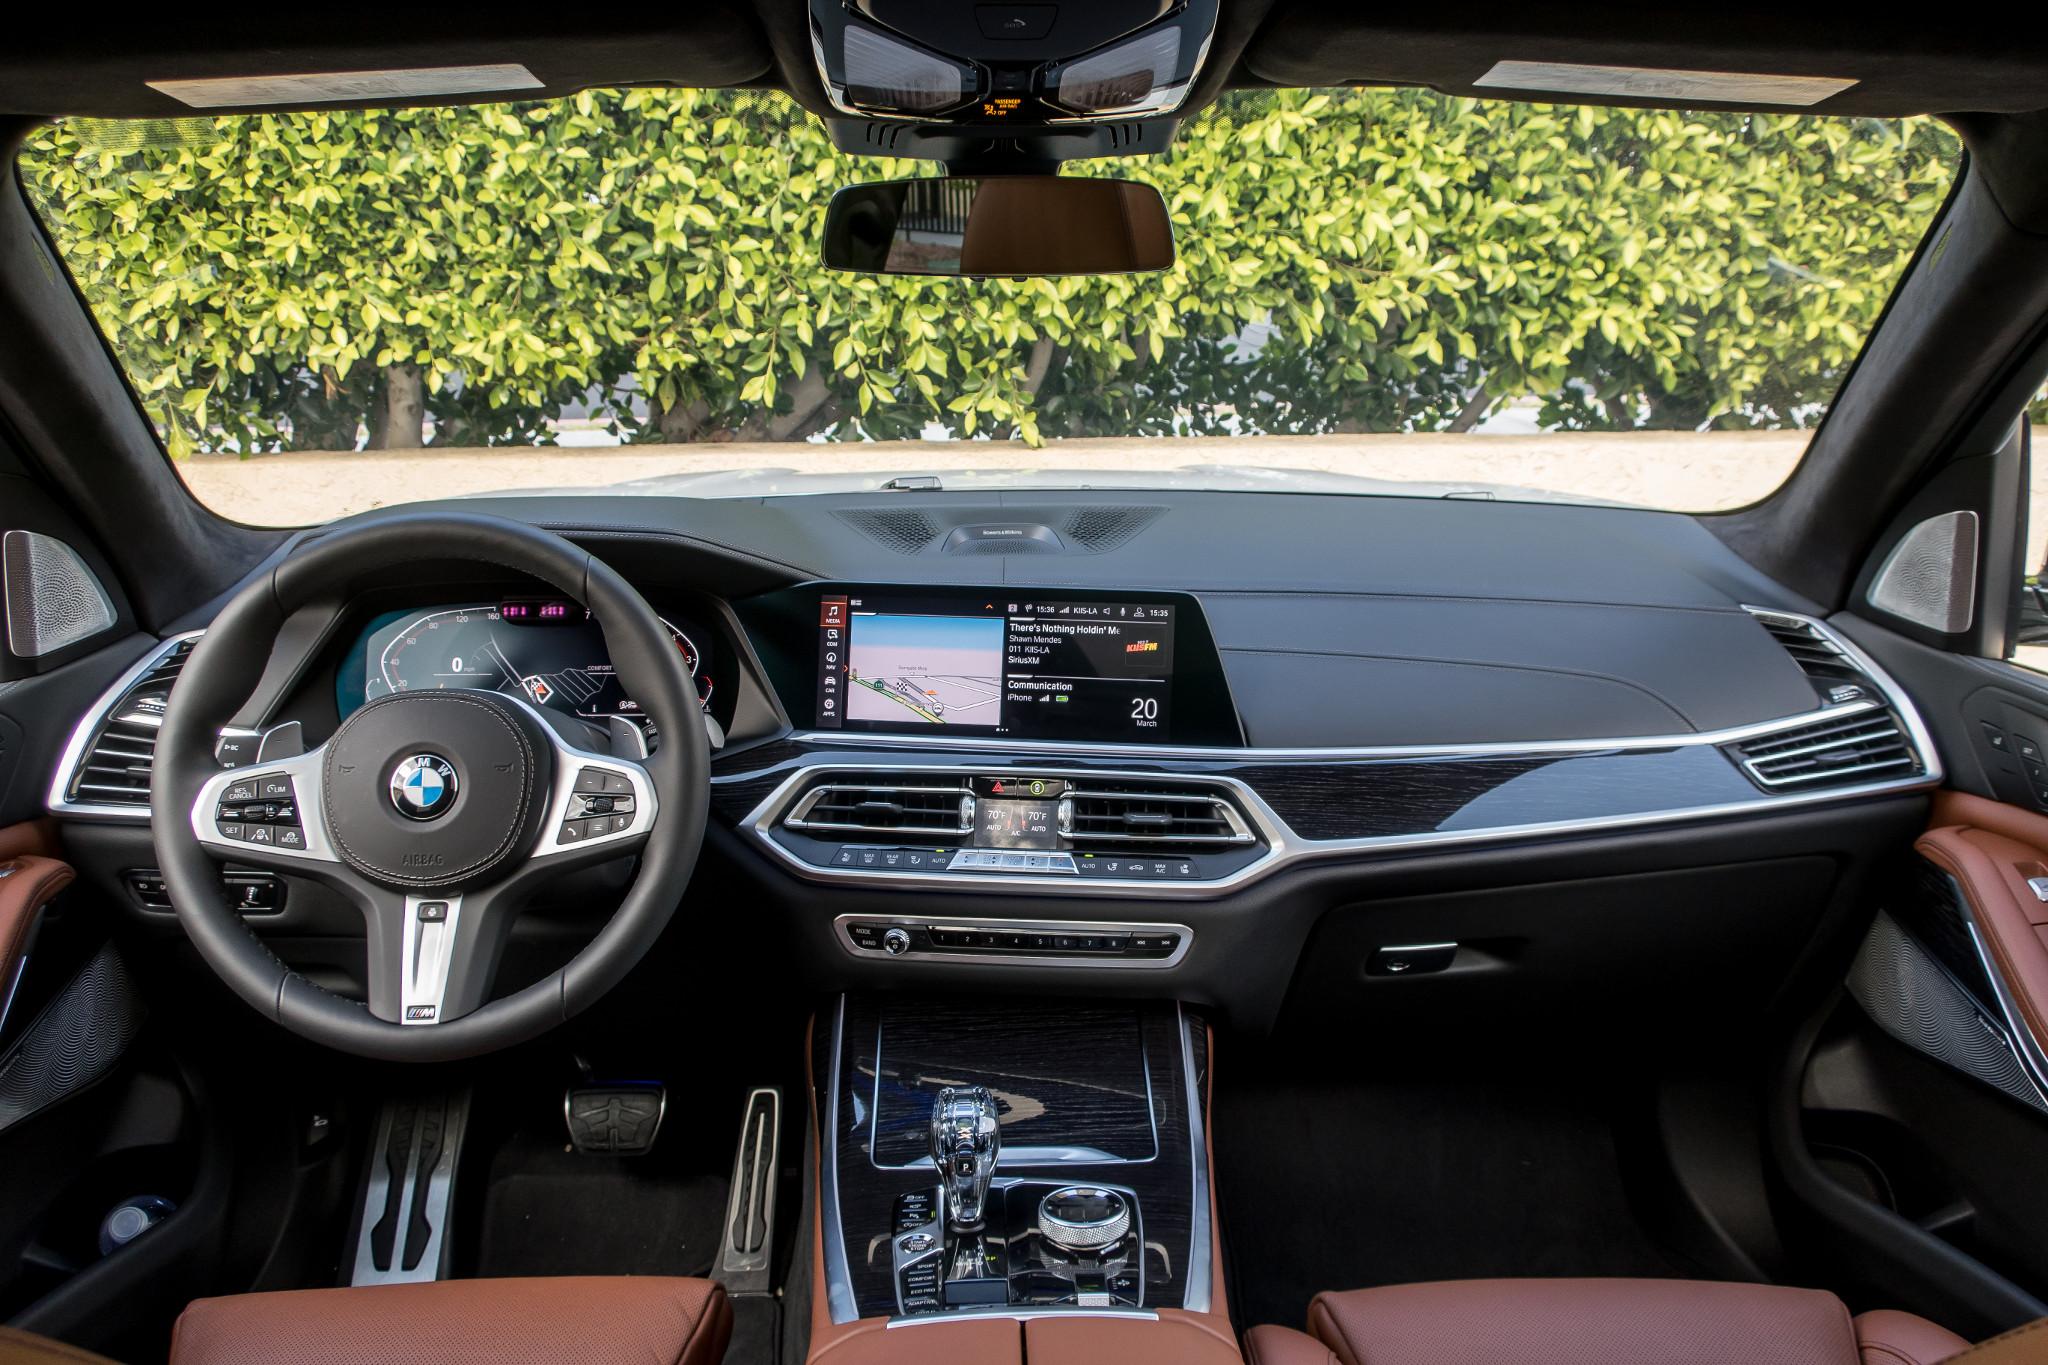 2019 Bmw X7 4 Things We Like 3 We Don T News Cars Com